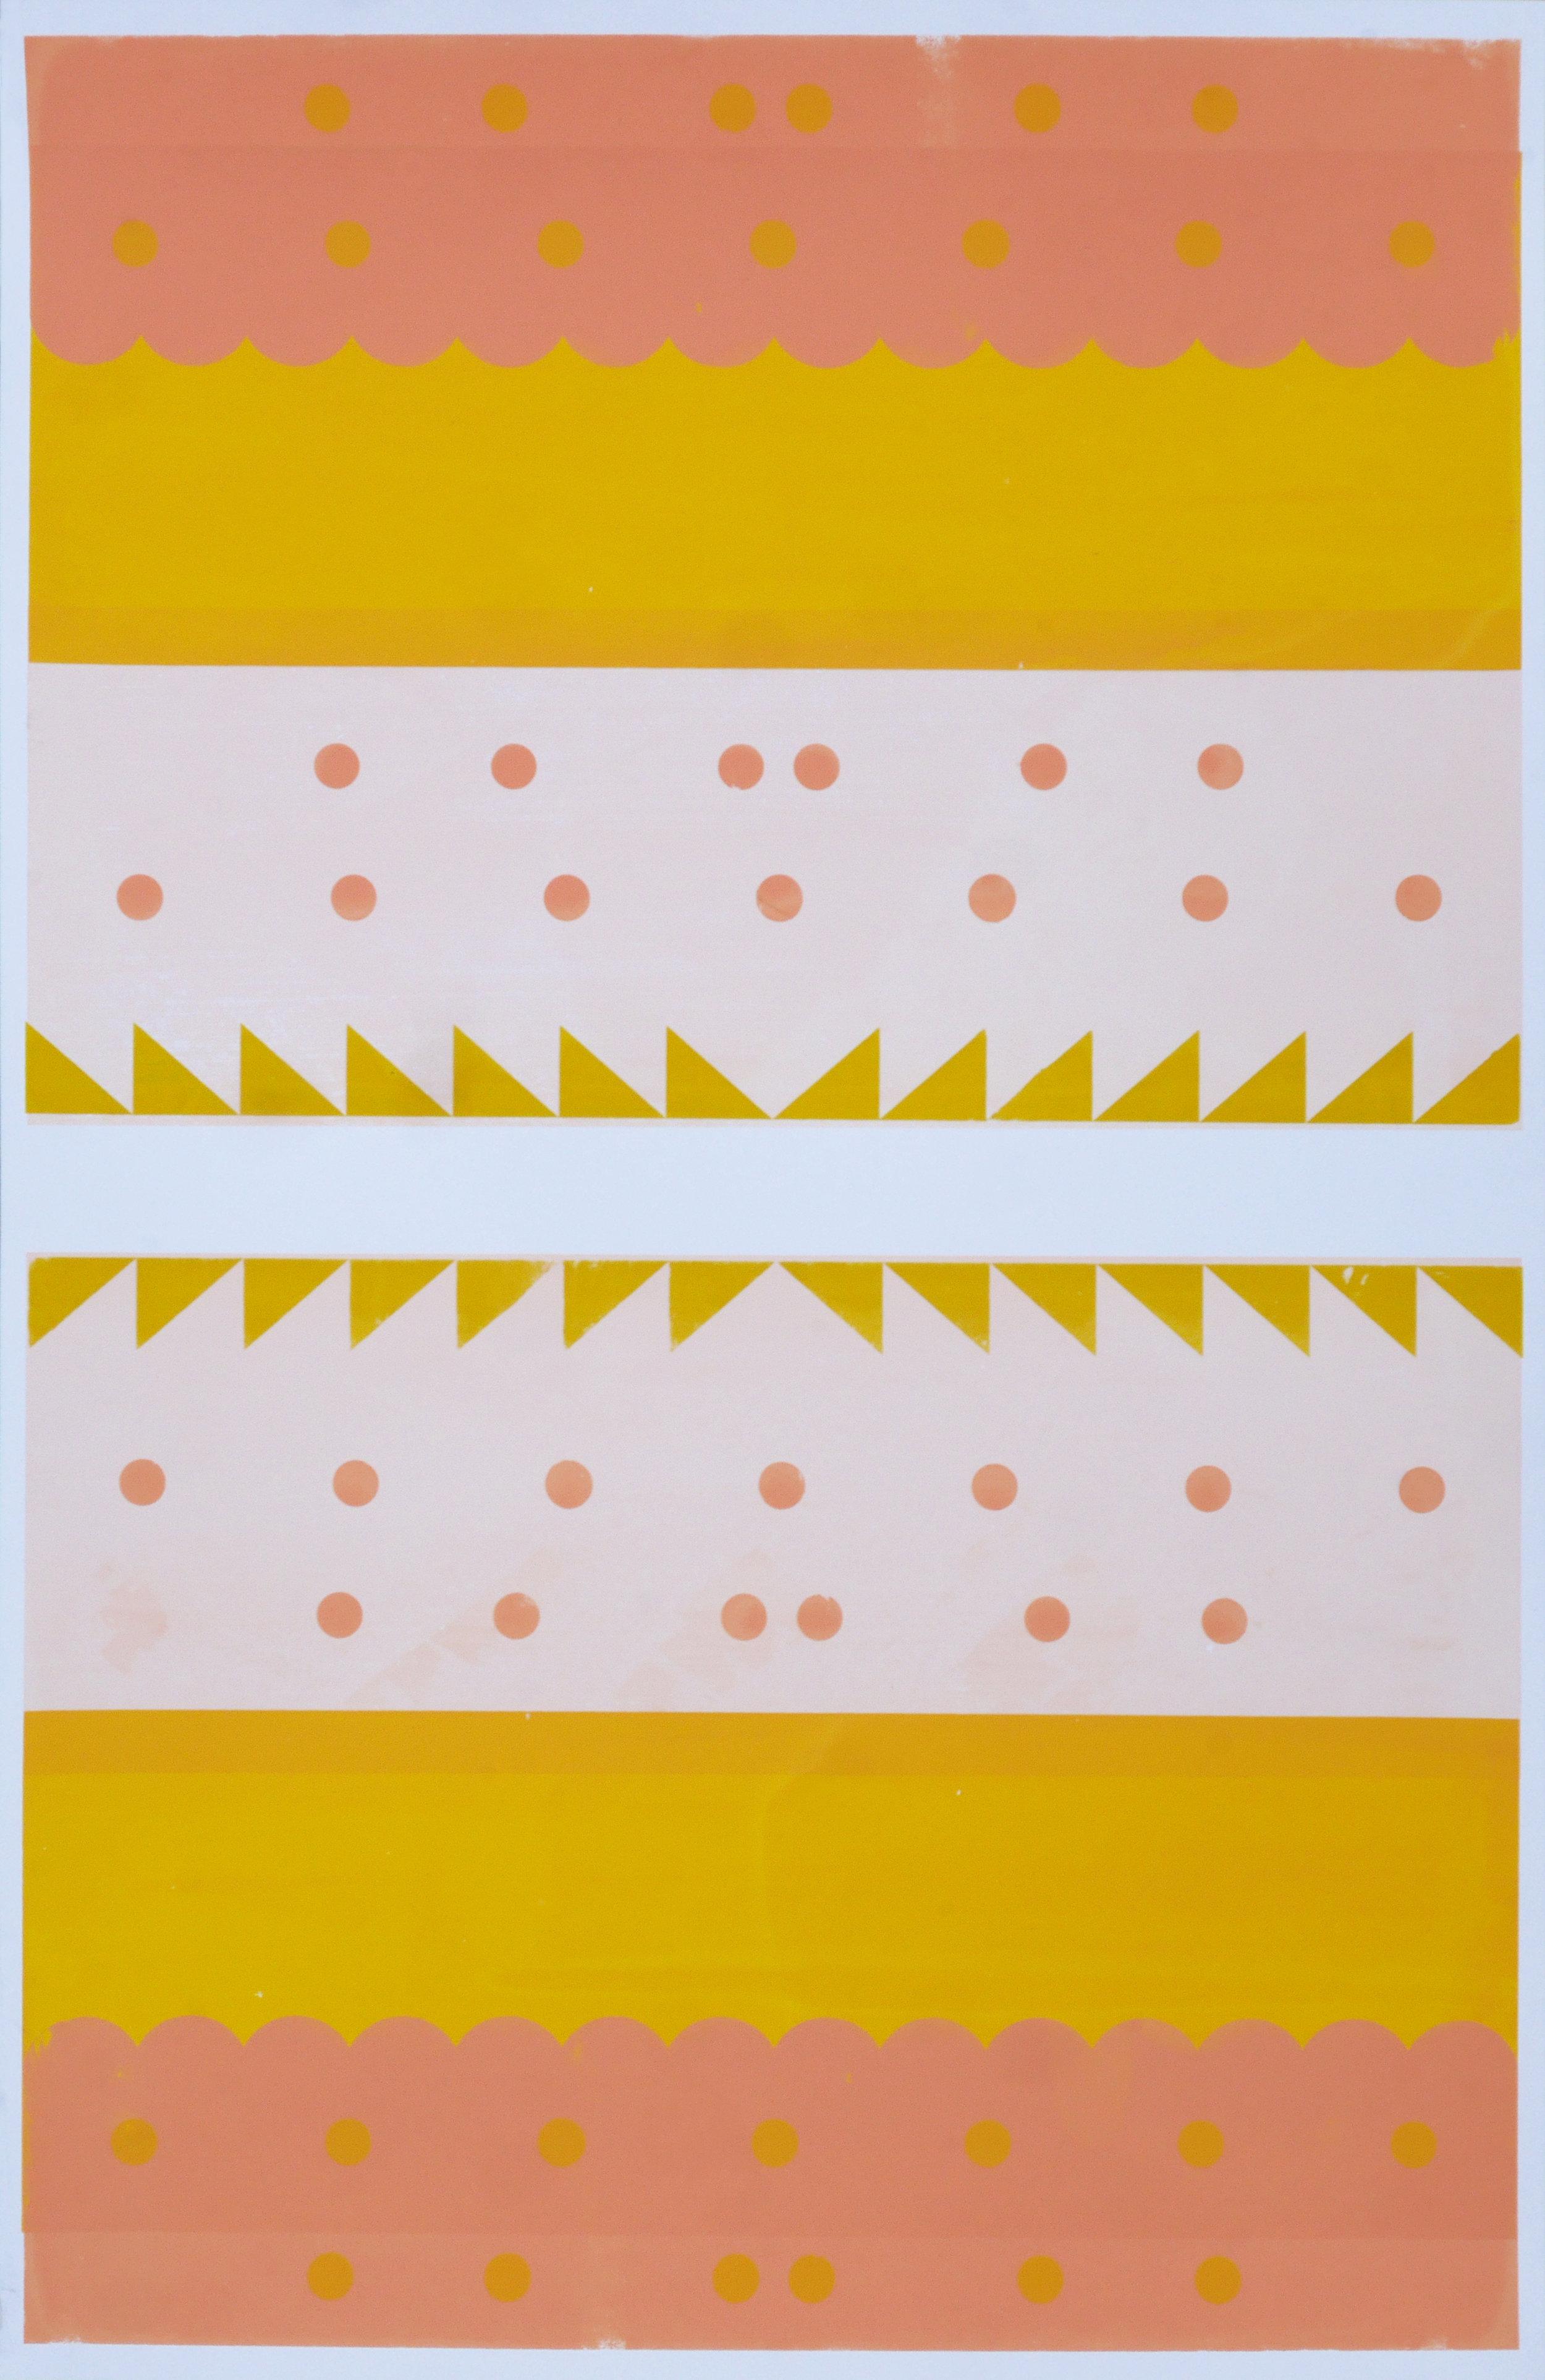 Tapestry 010